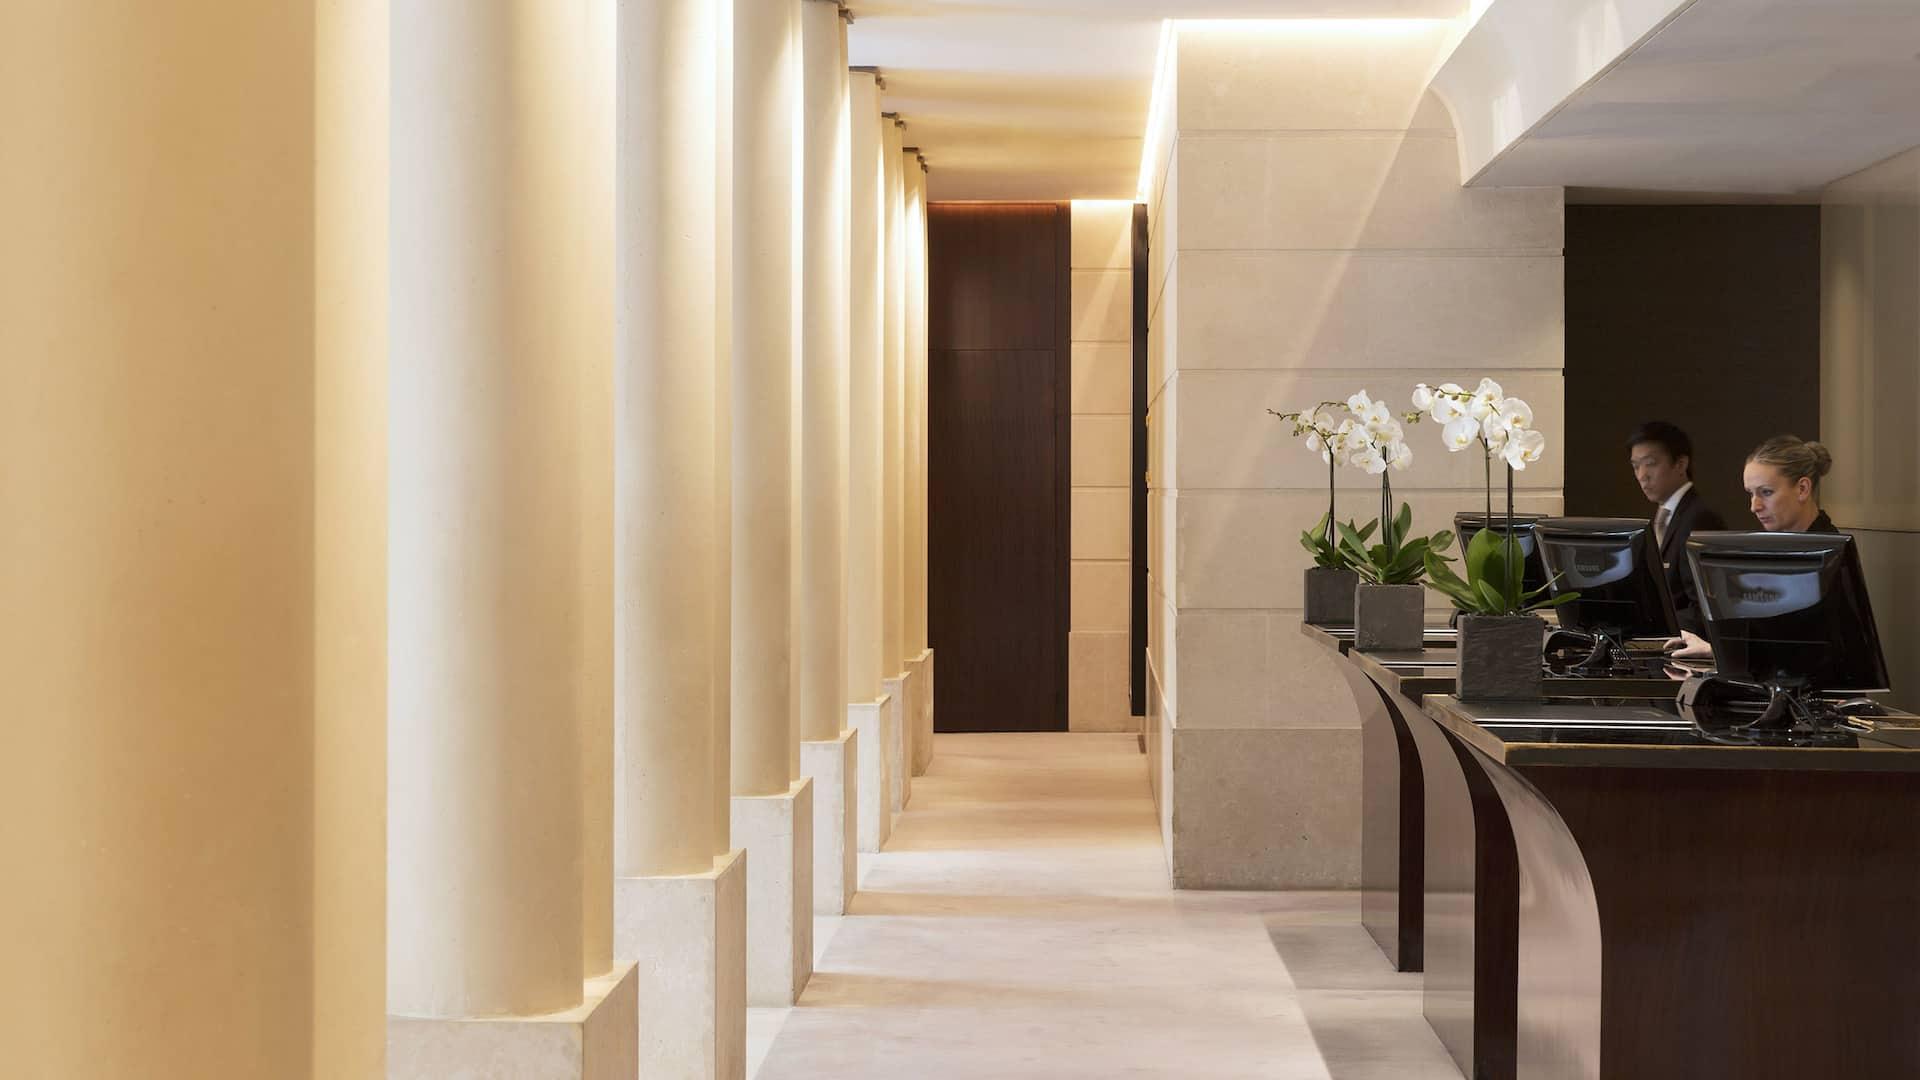 Lobby Hôtel Park Hyatt Paris-Vendôme in central Paris